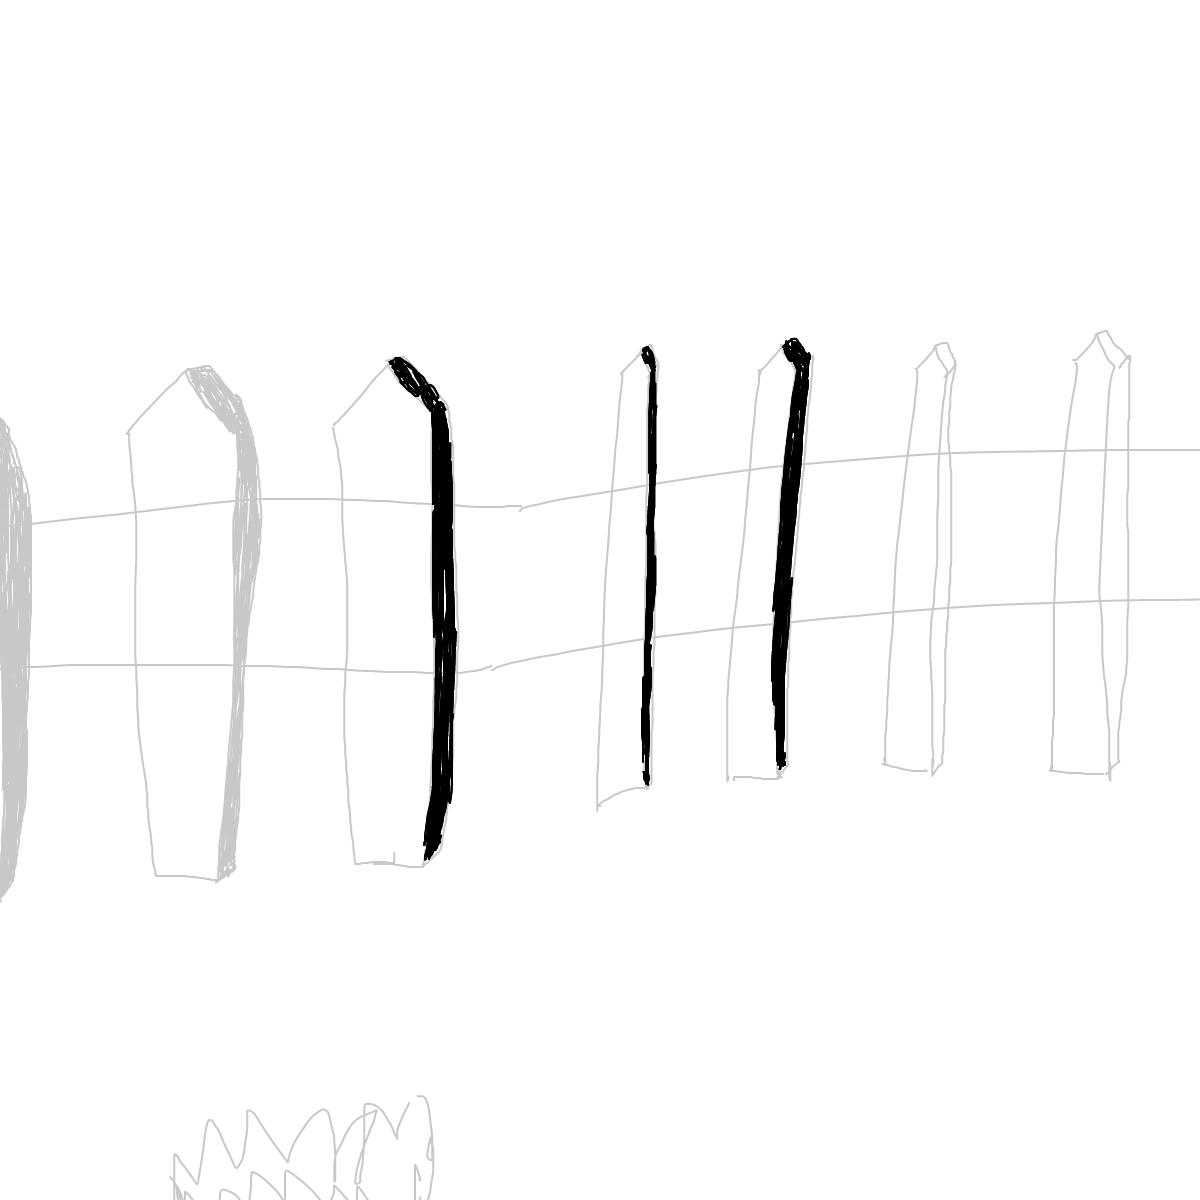 BAAAM drawing#9609 lat:52.4750747680664060lng: 13.4067049026489260